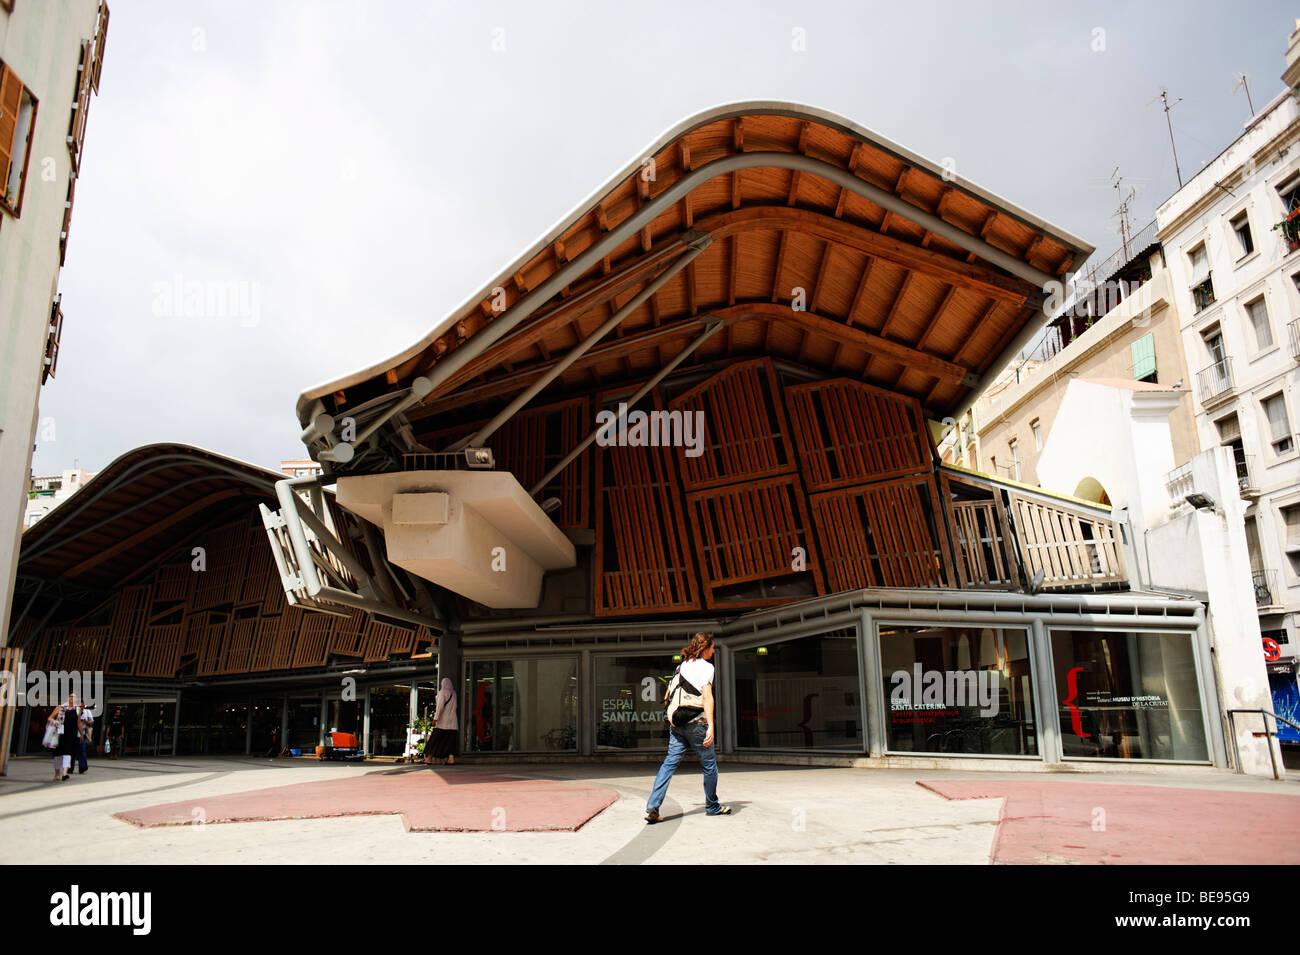 Mercat Santa Caterina market. Barri Gottic. Barcelona. Spain - Stock Image